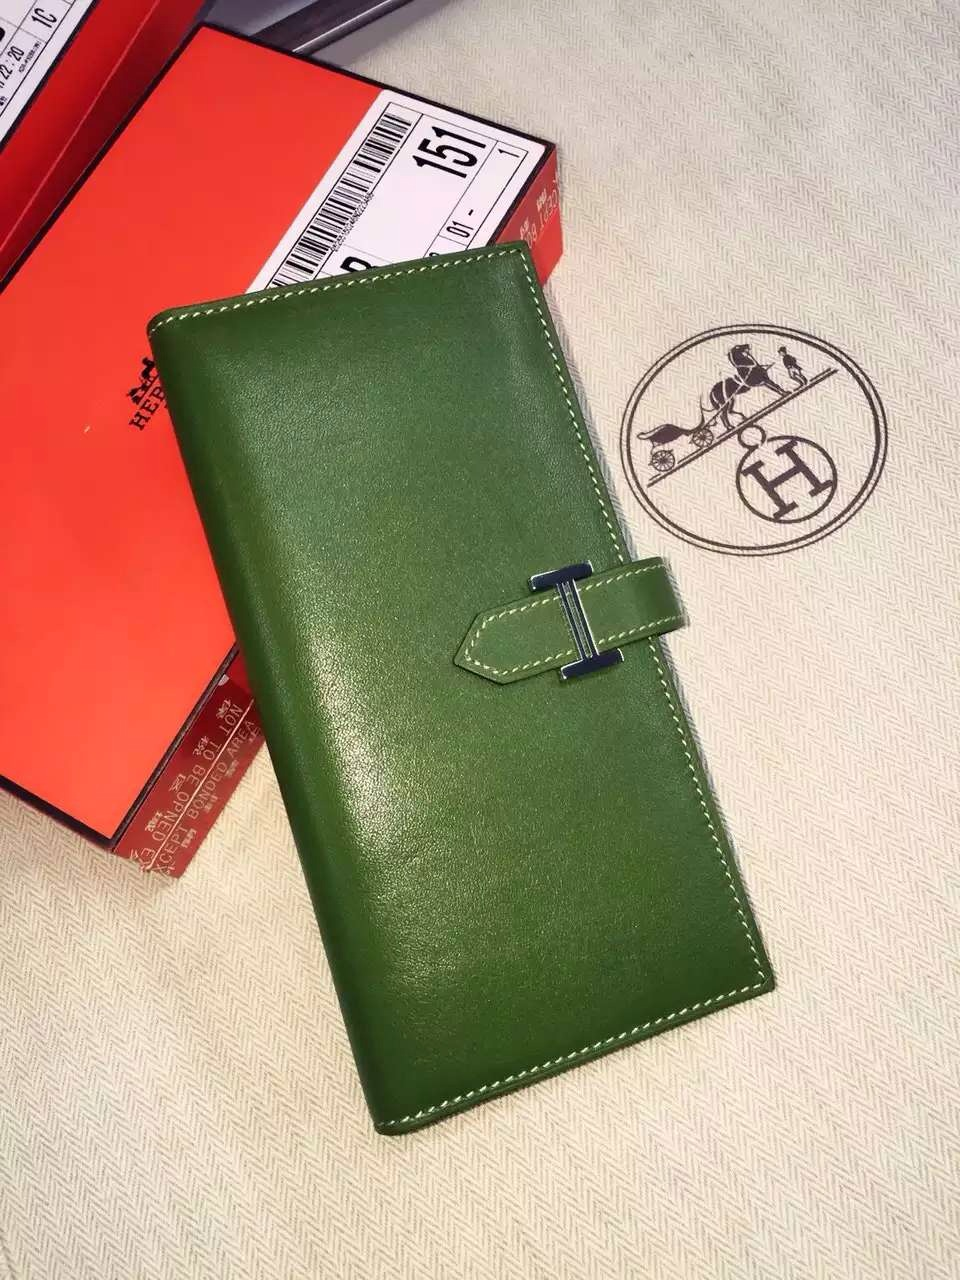 19CM Hermes V6 Olive Green Swift Leather Bean Women's Long Wallet Clutch Bag